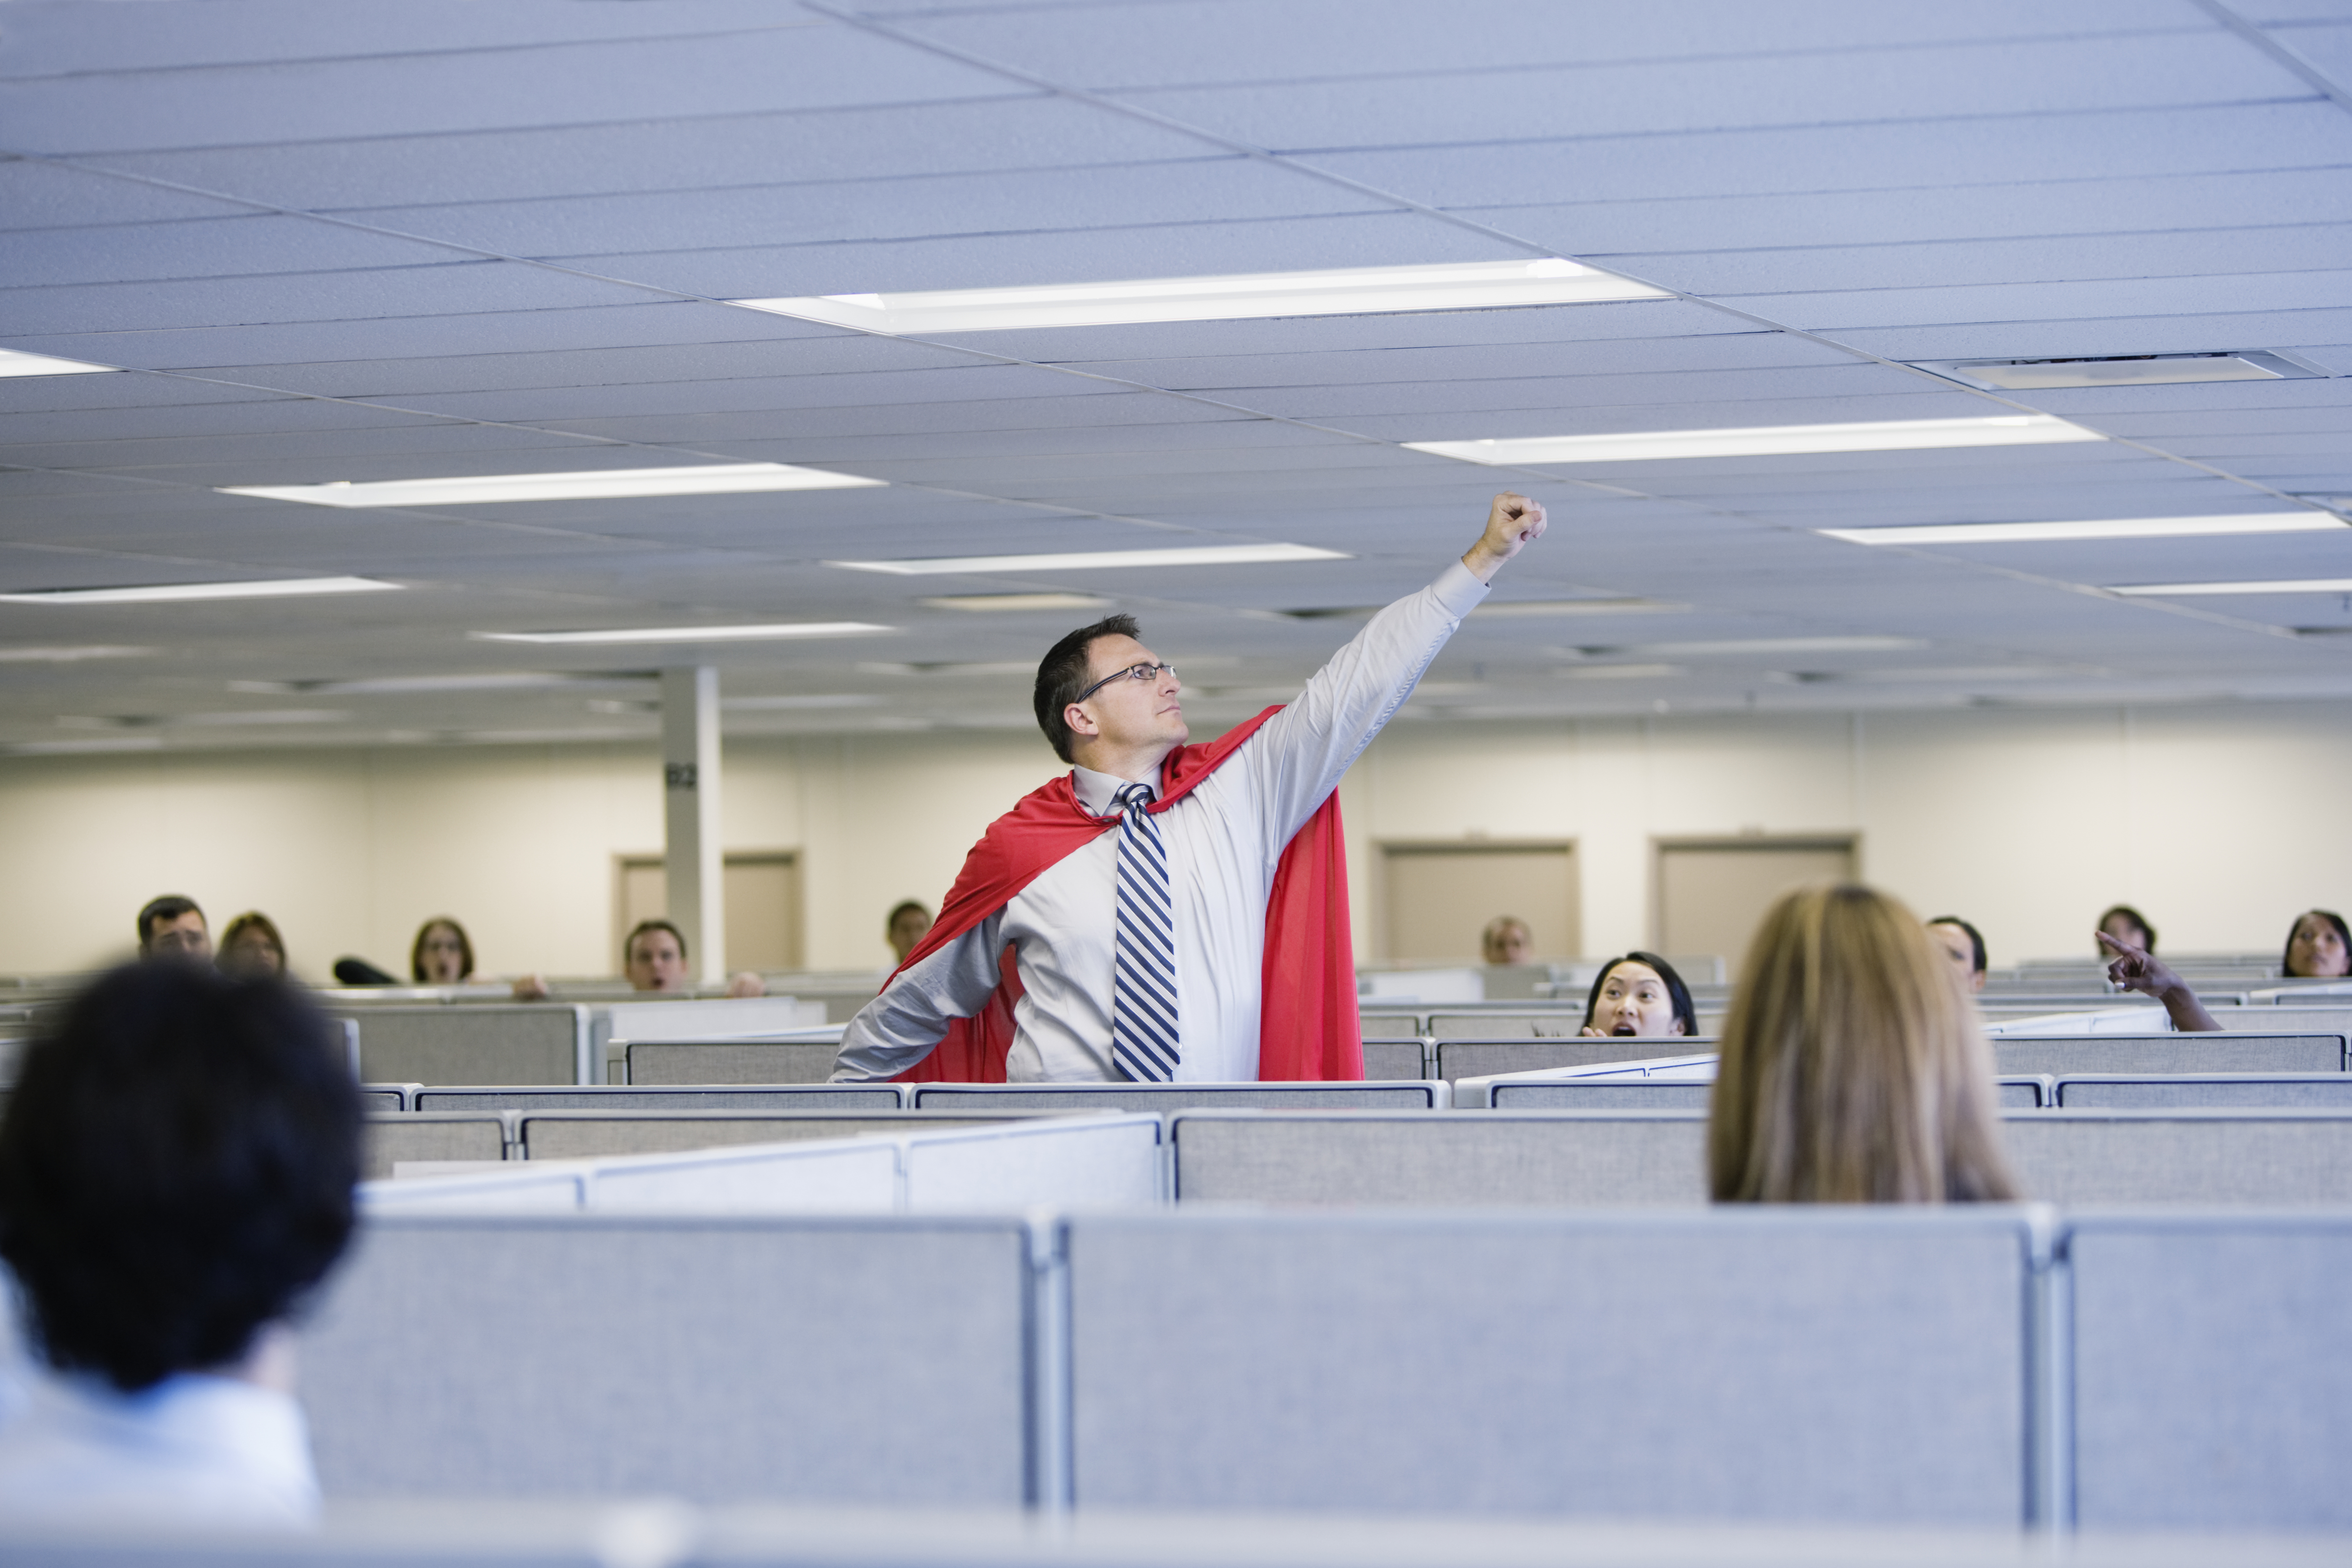 Man wearing superhero costume in office pretending to fly